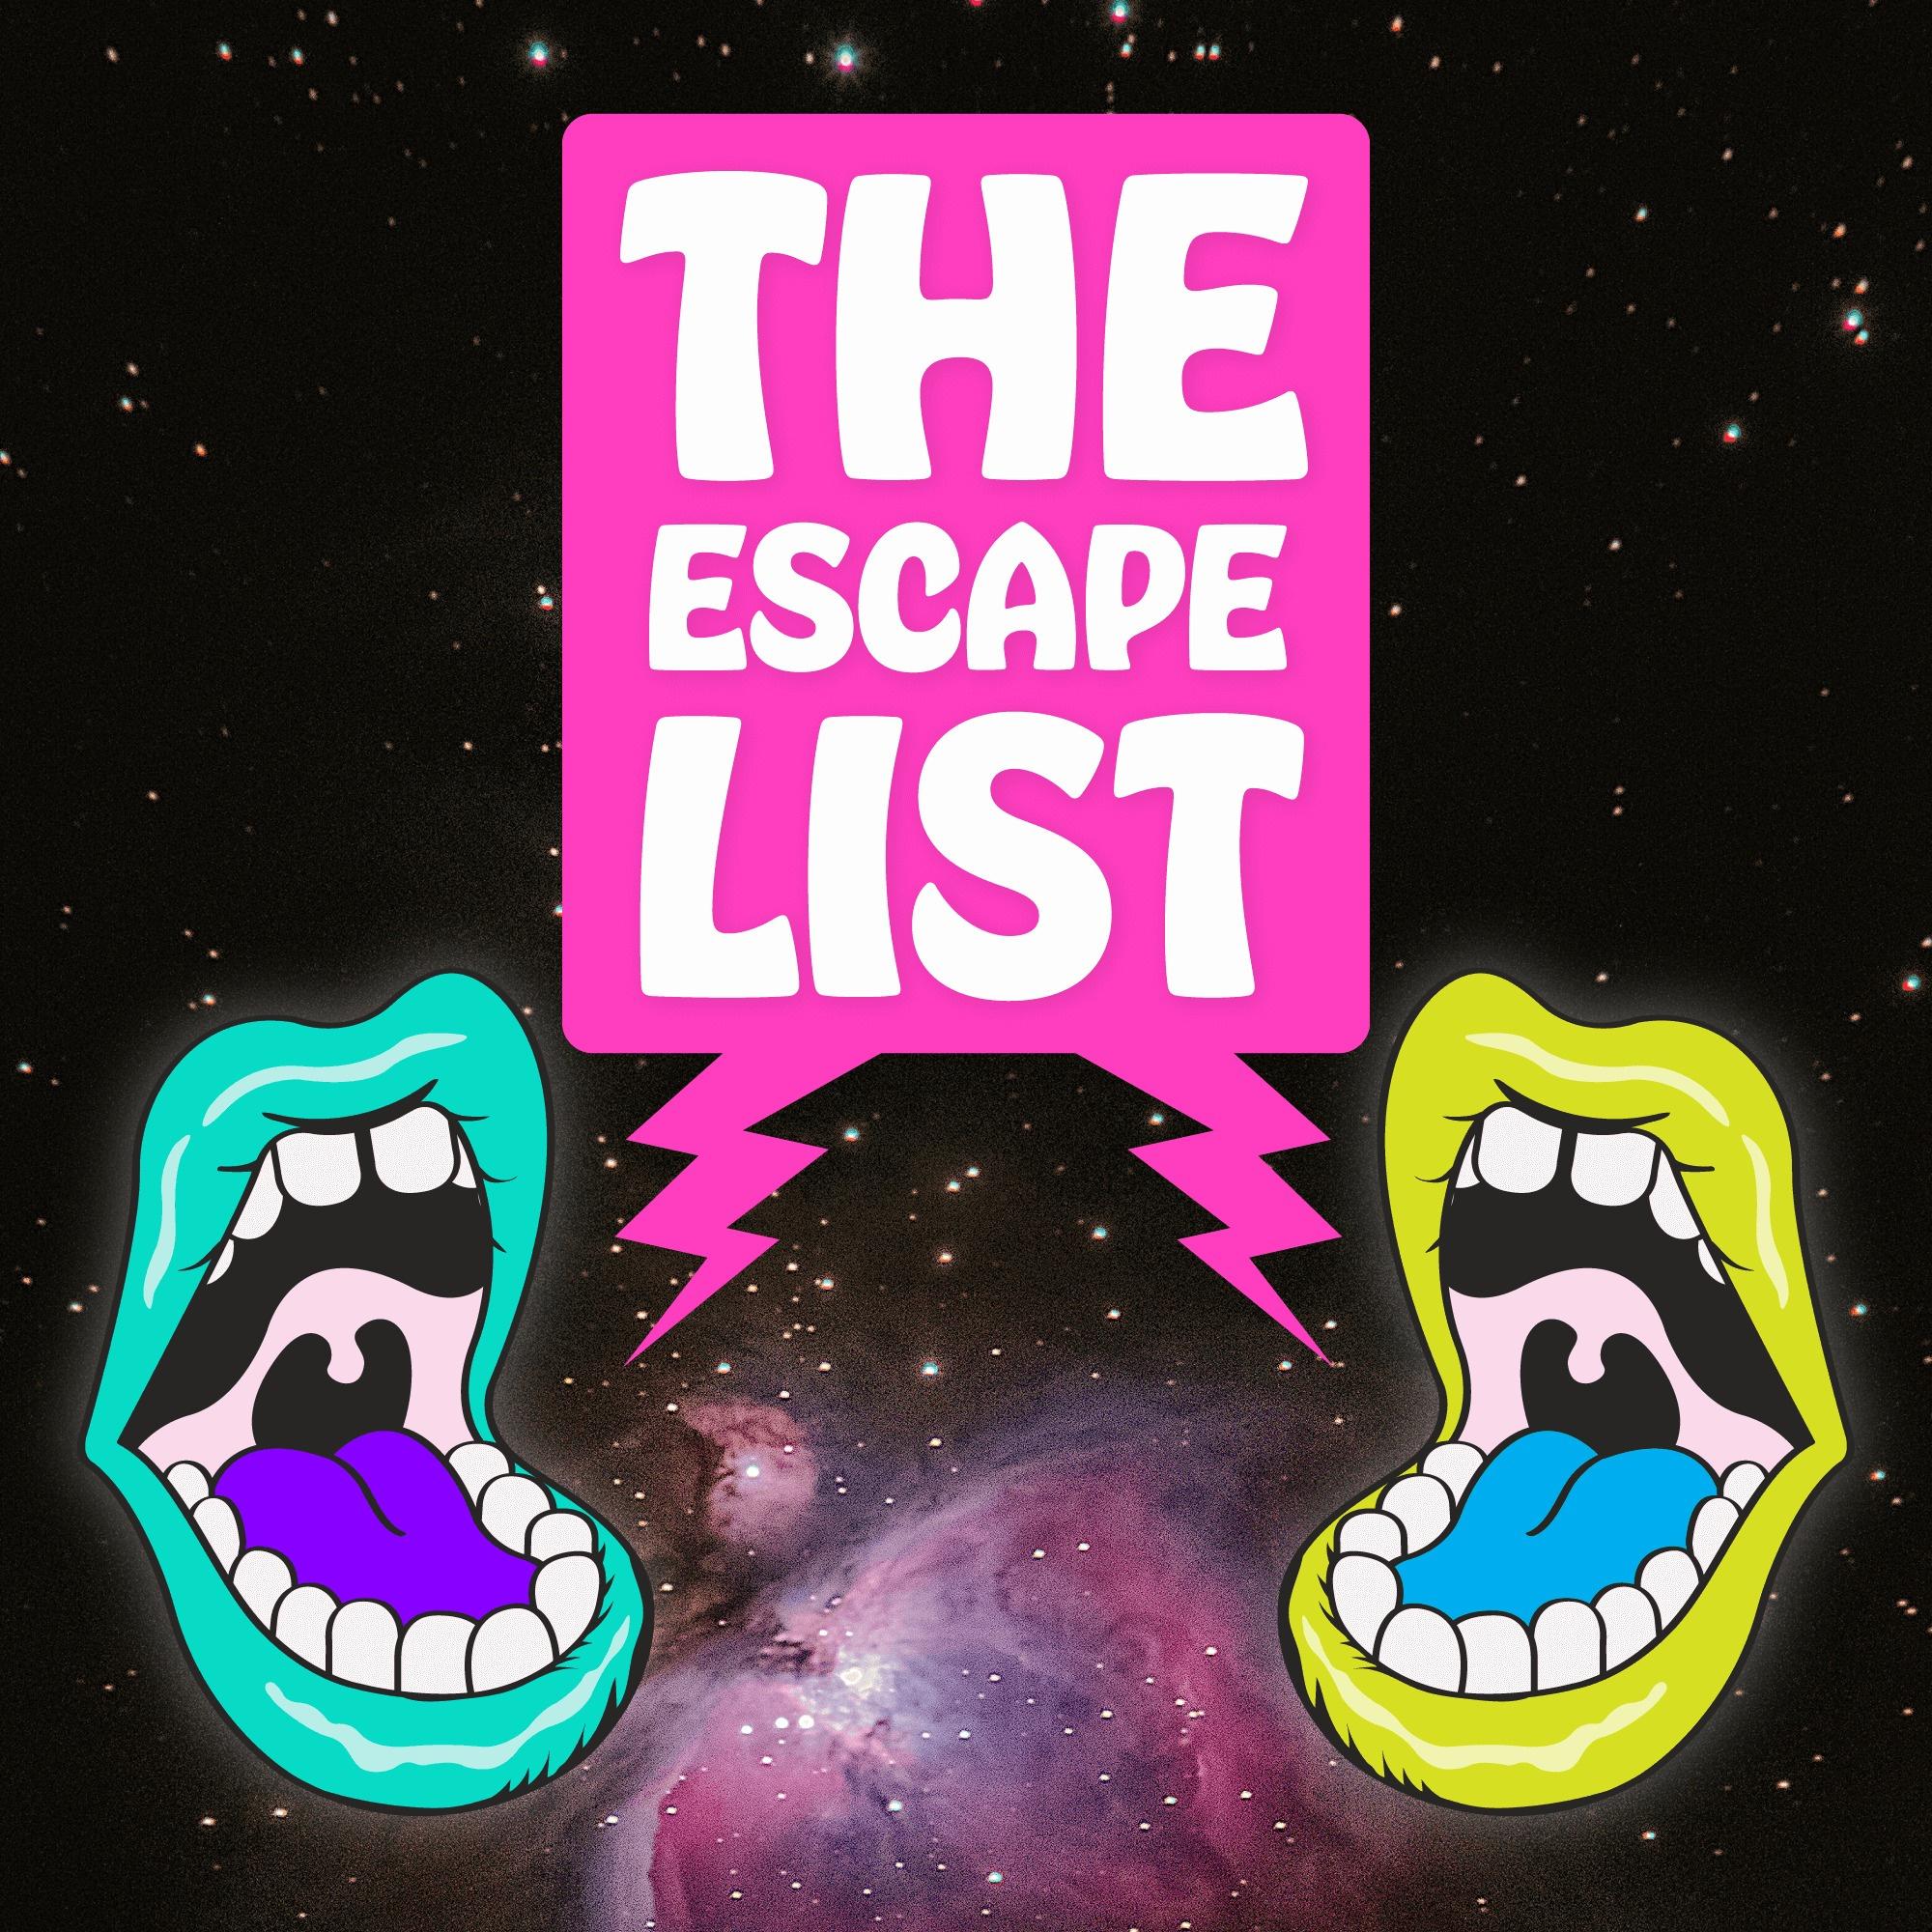 The Escape List